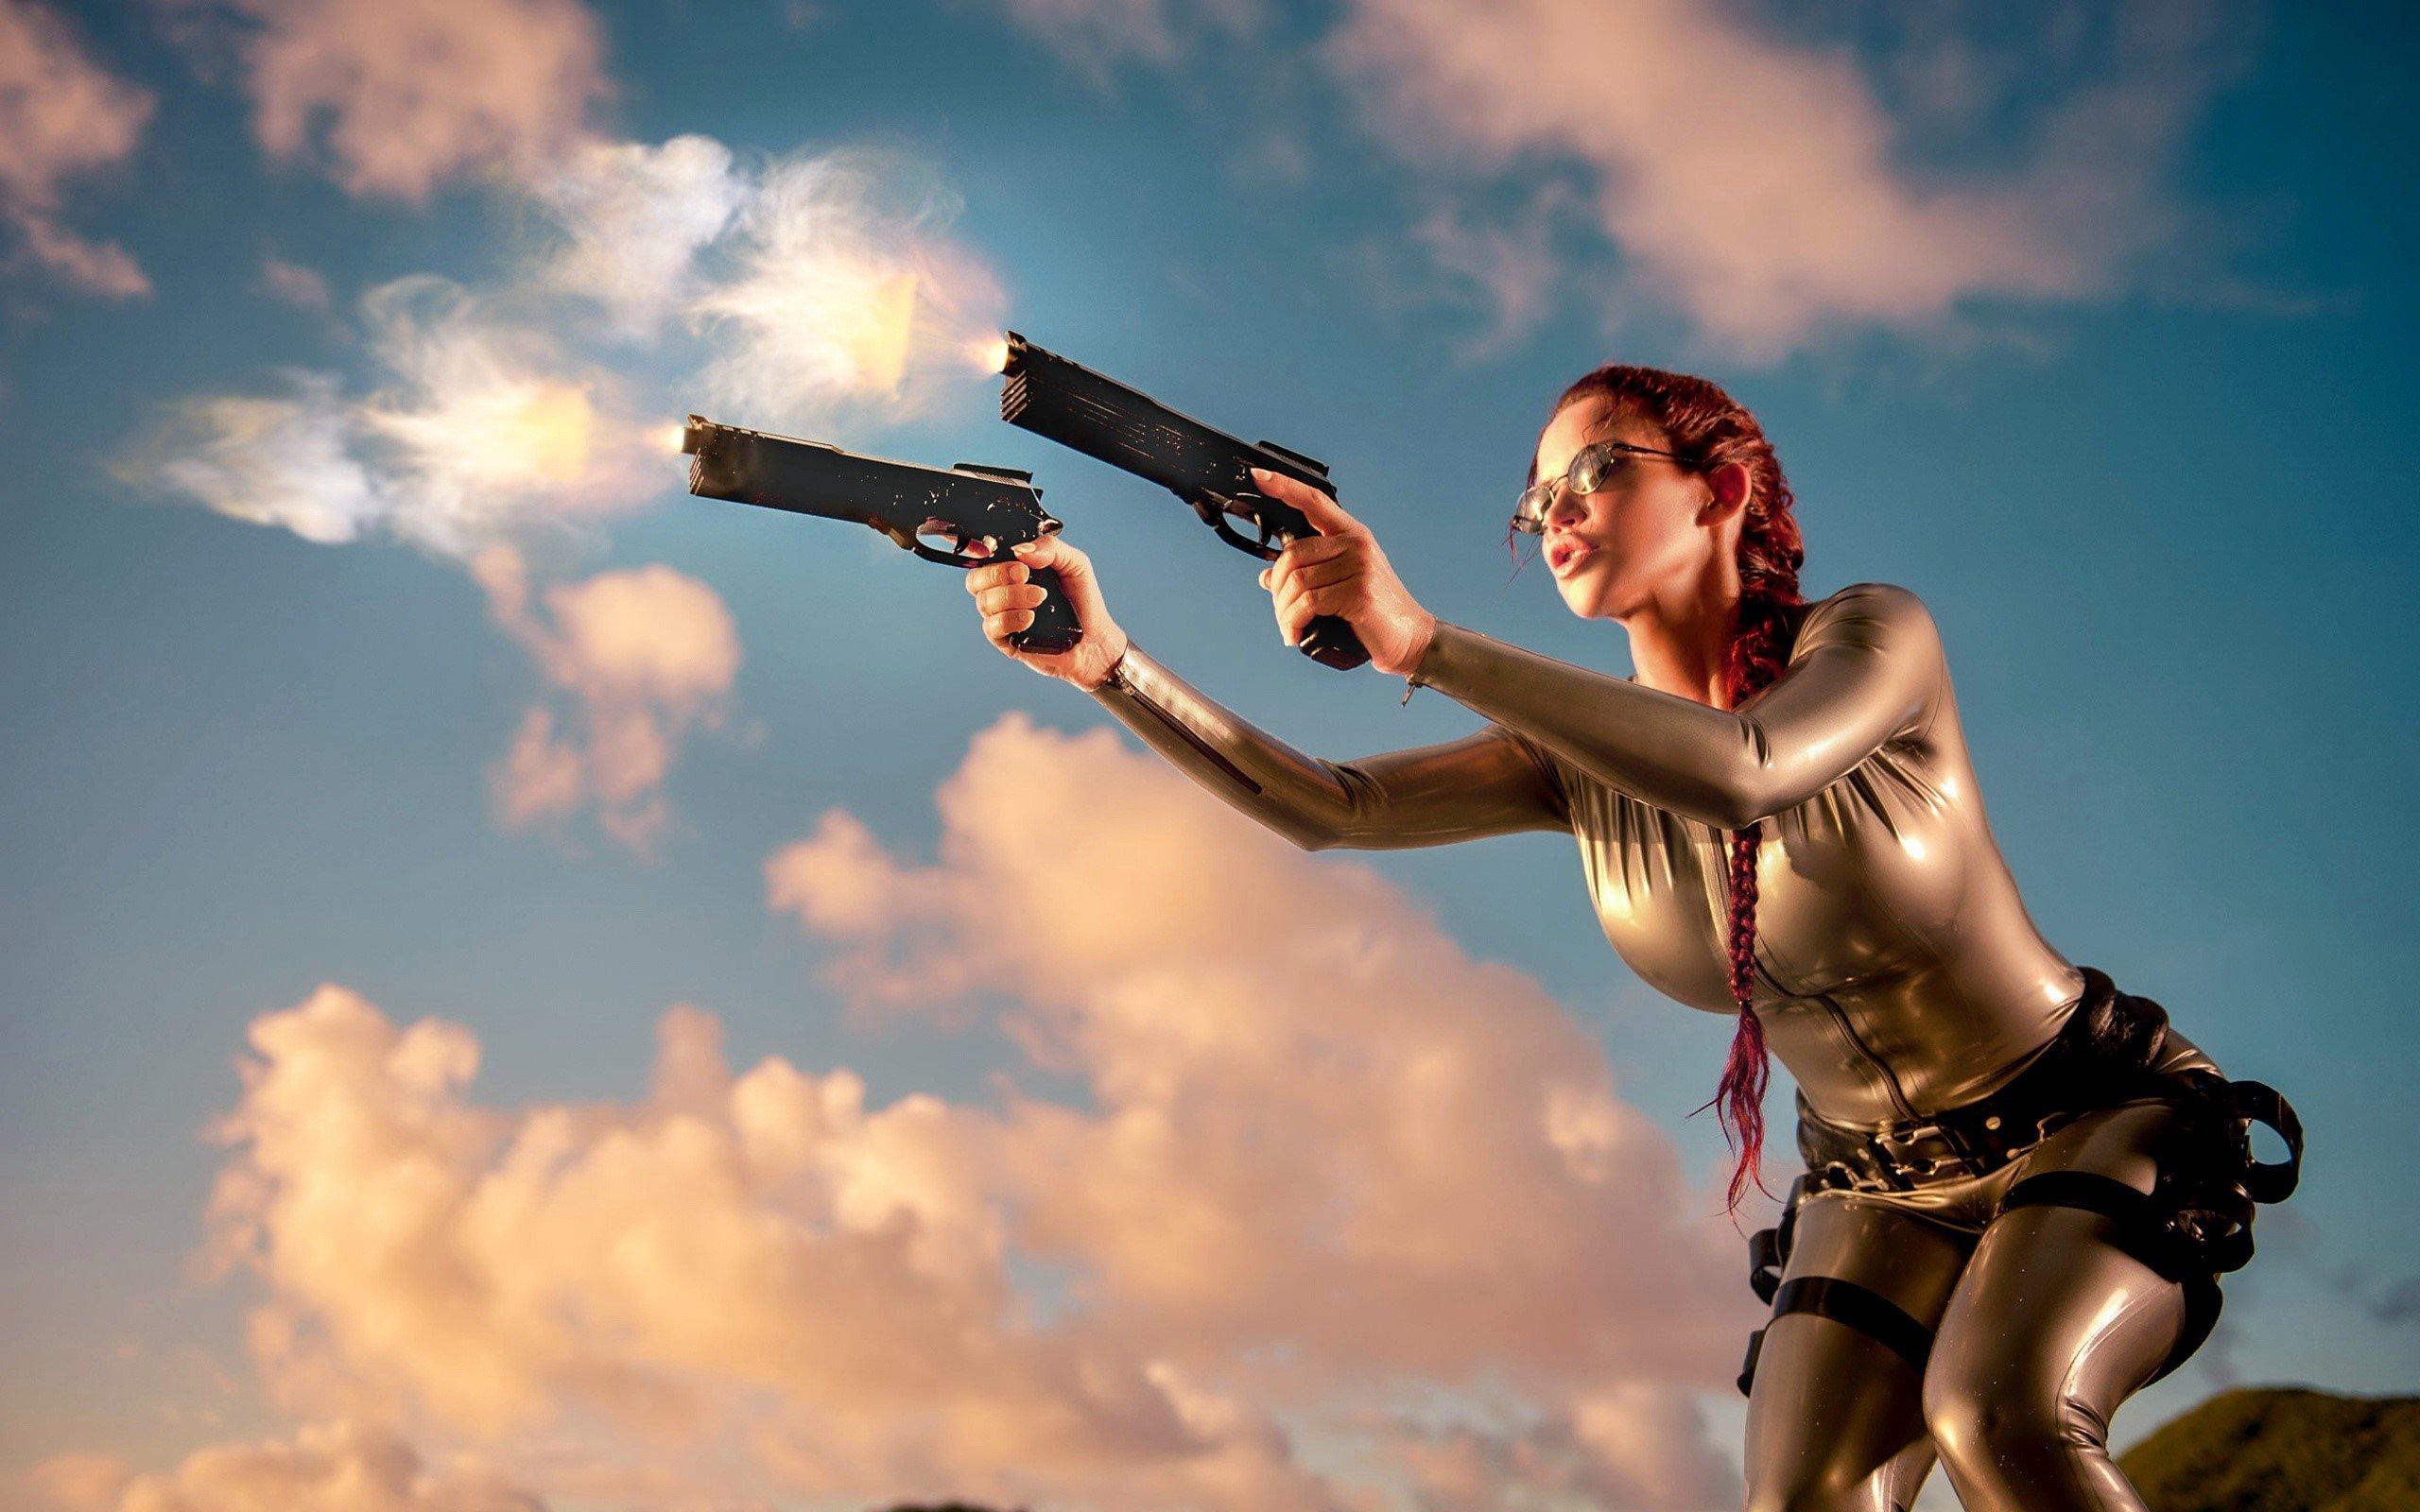 Fondos de pantalla Lara Croft con pistolas